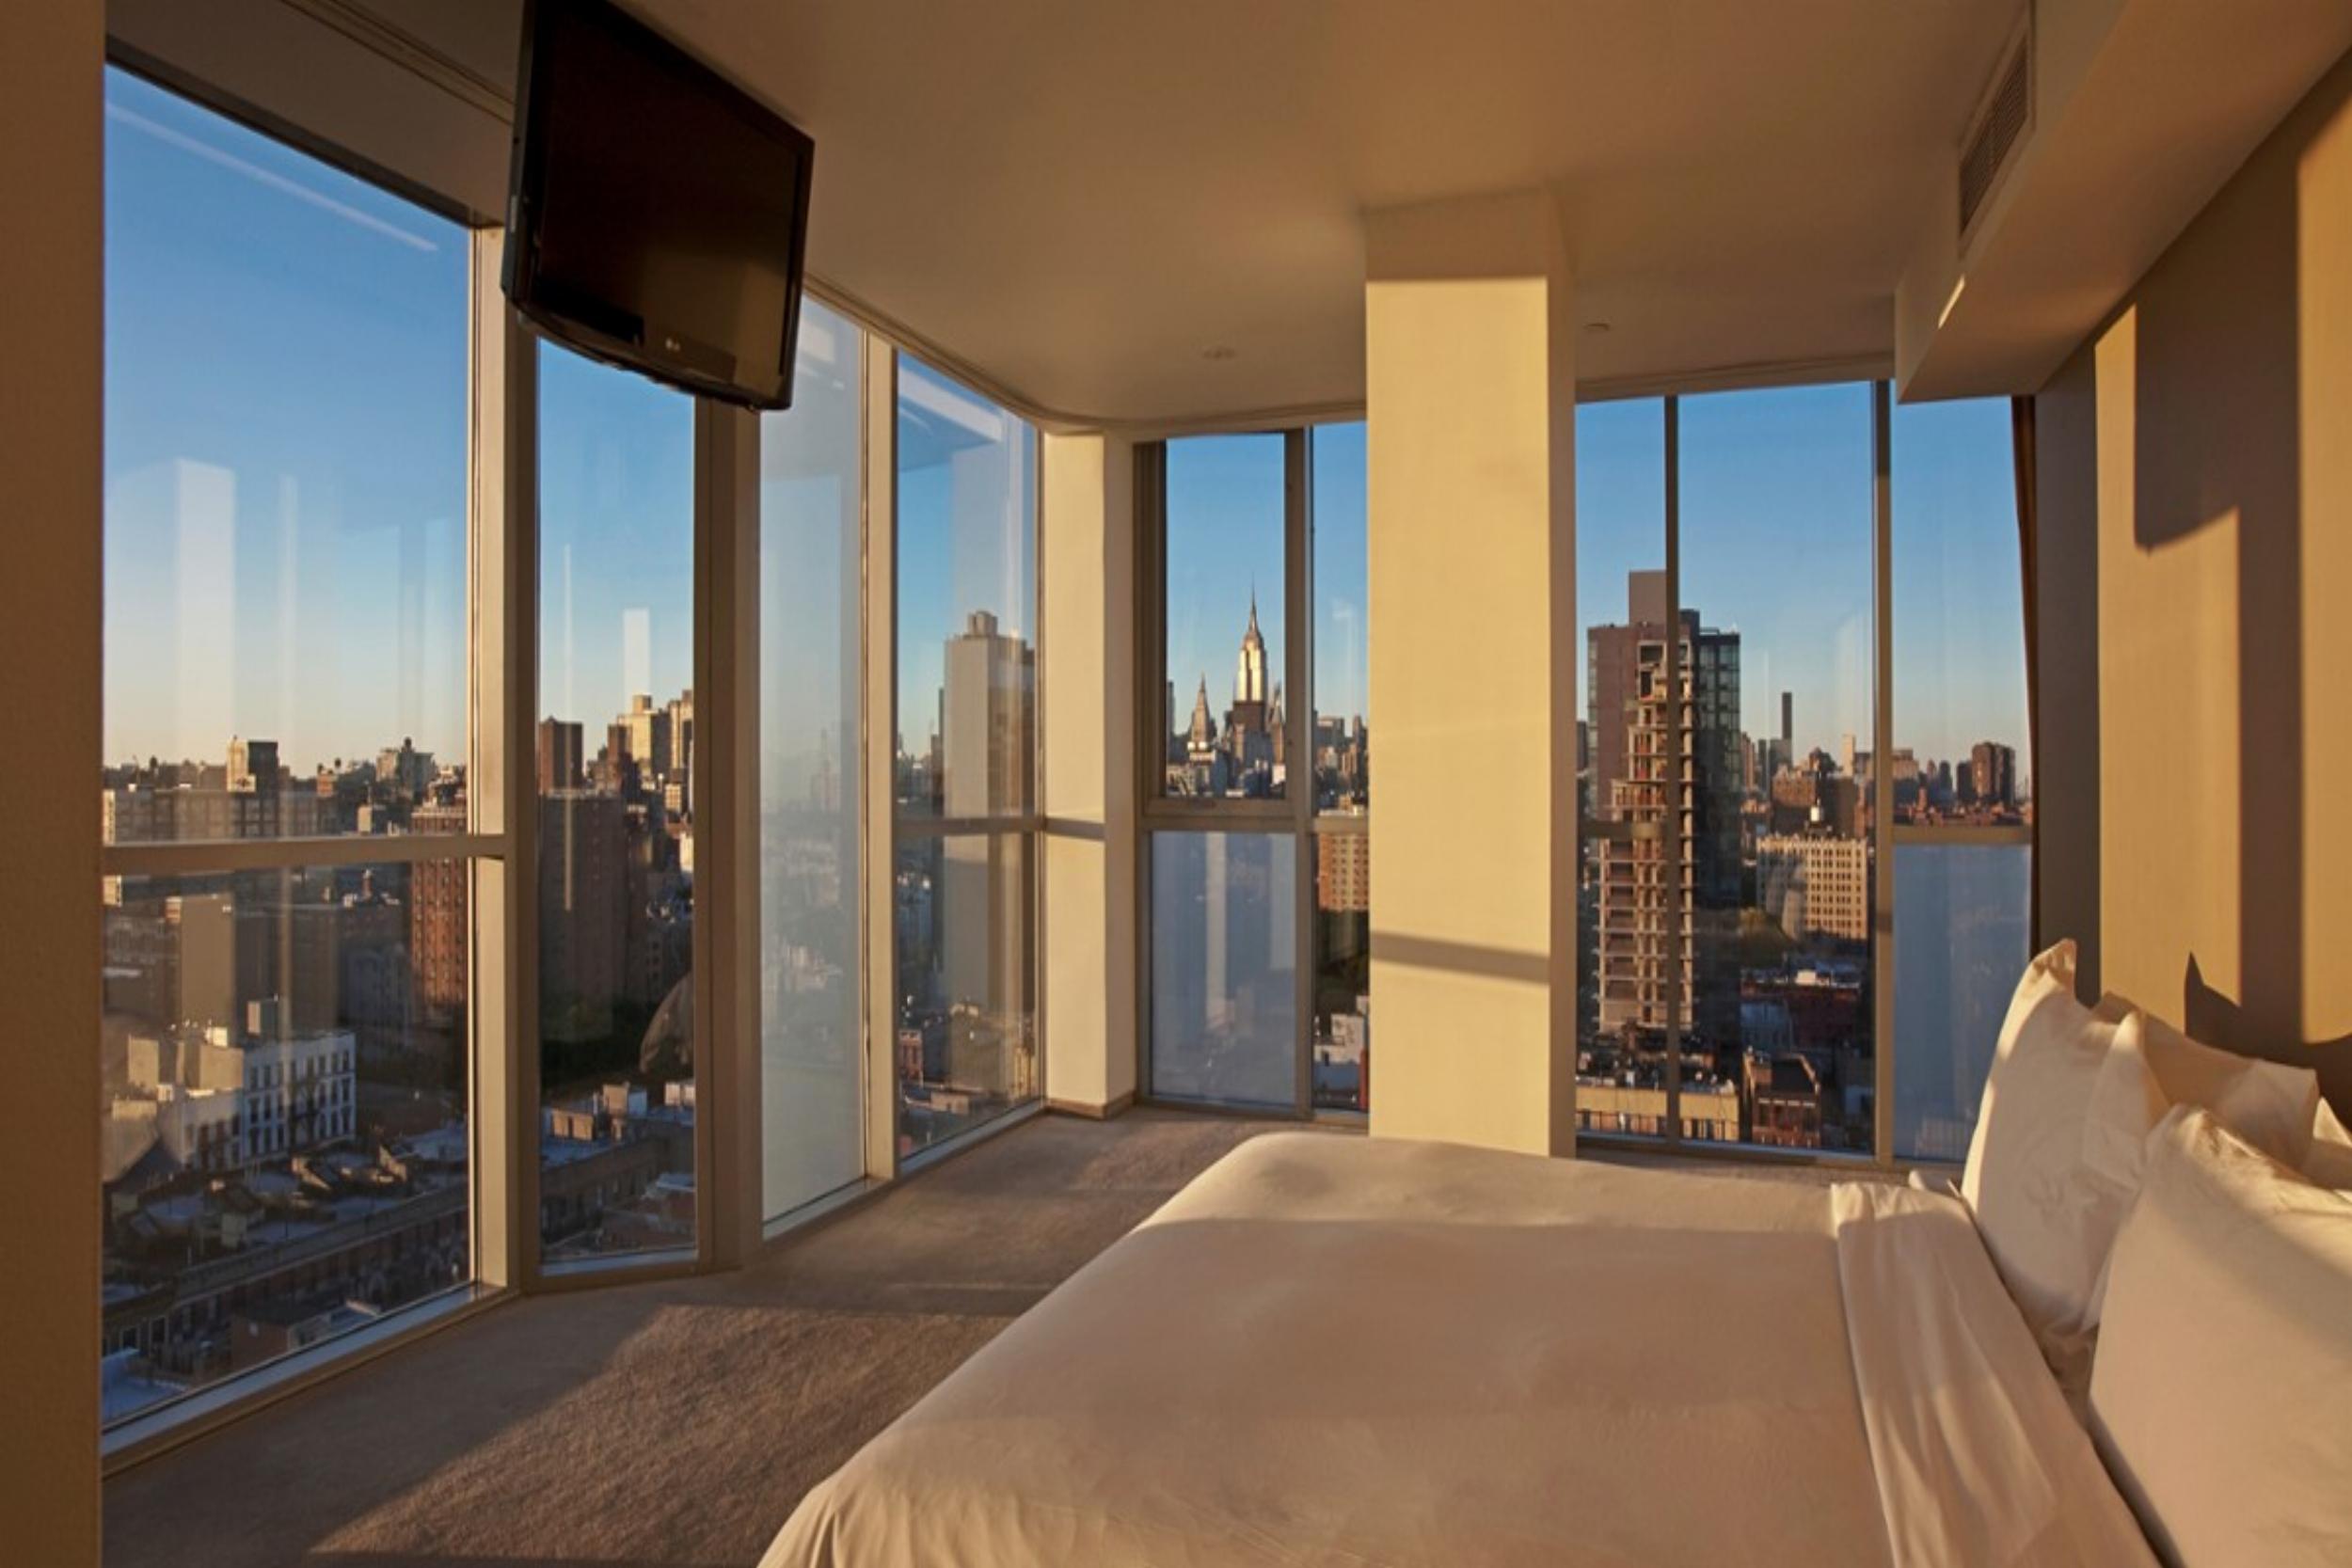 hotel-on-rivington-new-york-city8564_201412021523403239.jpg